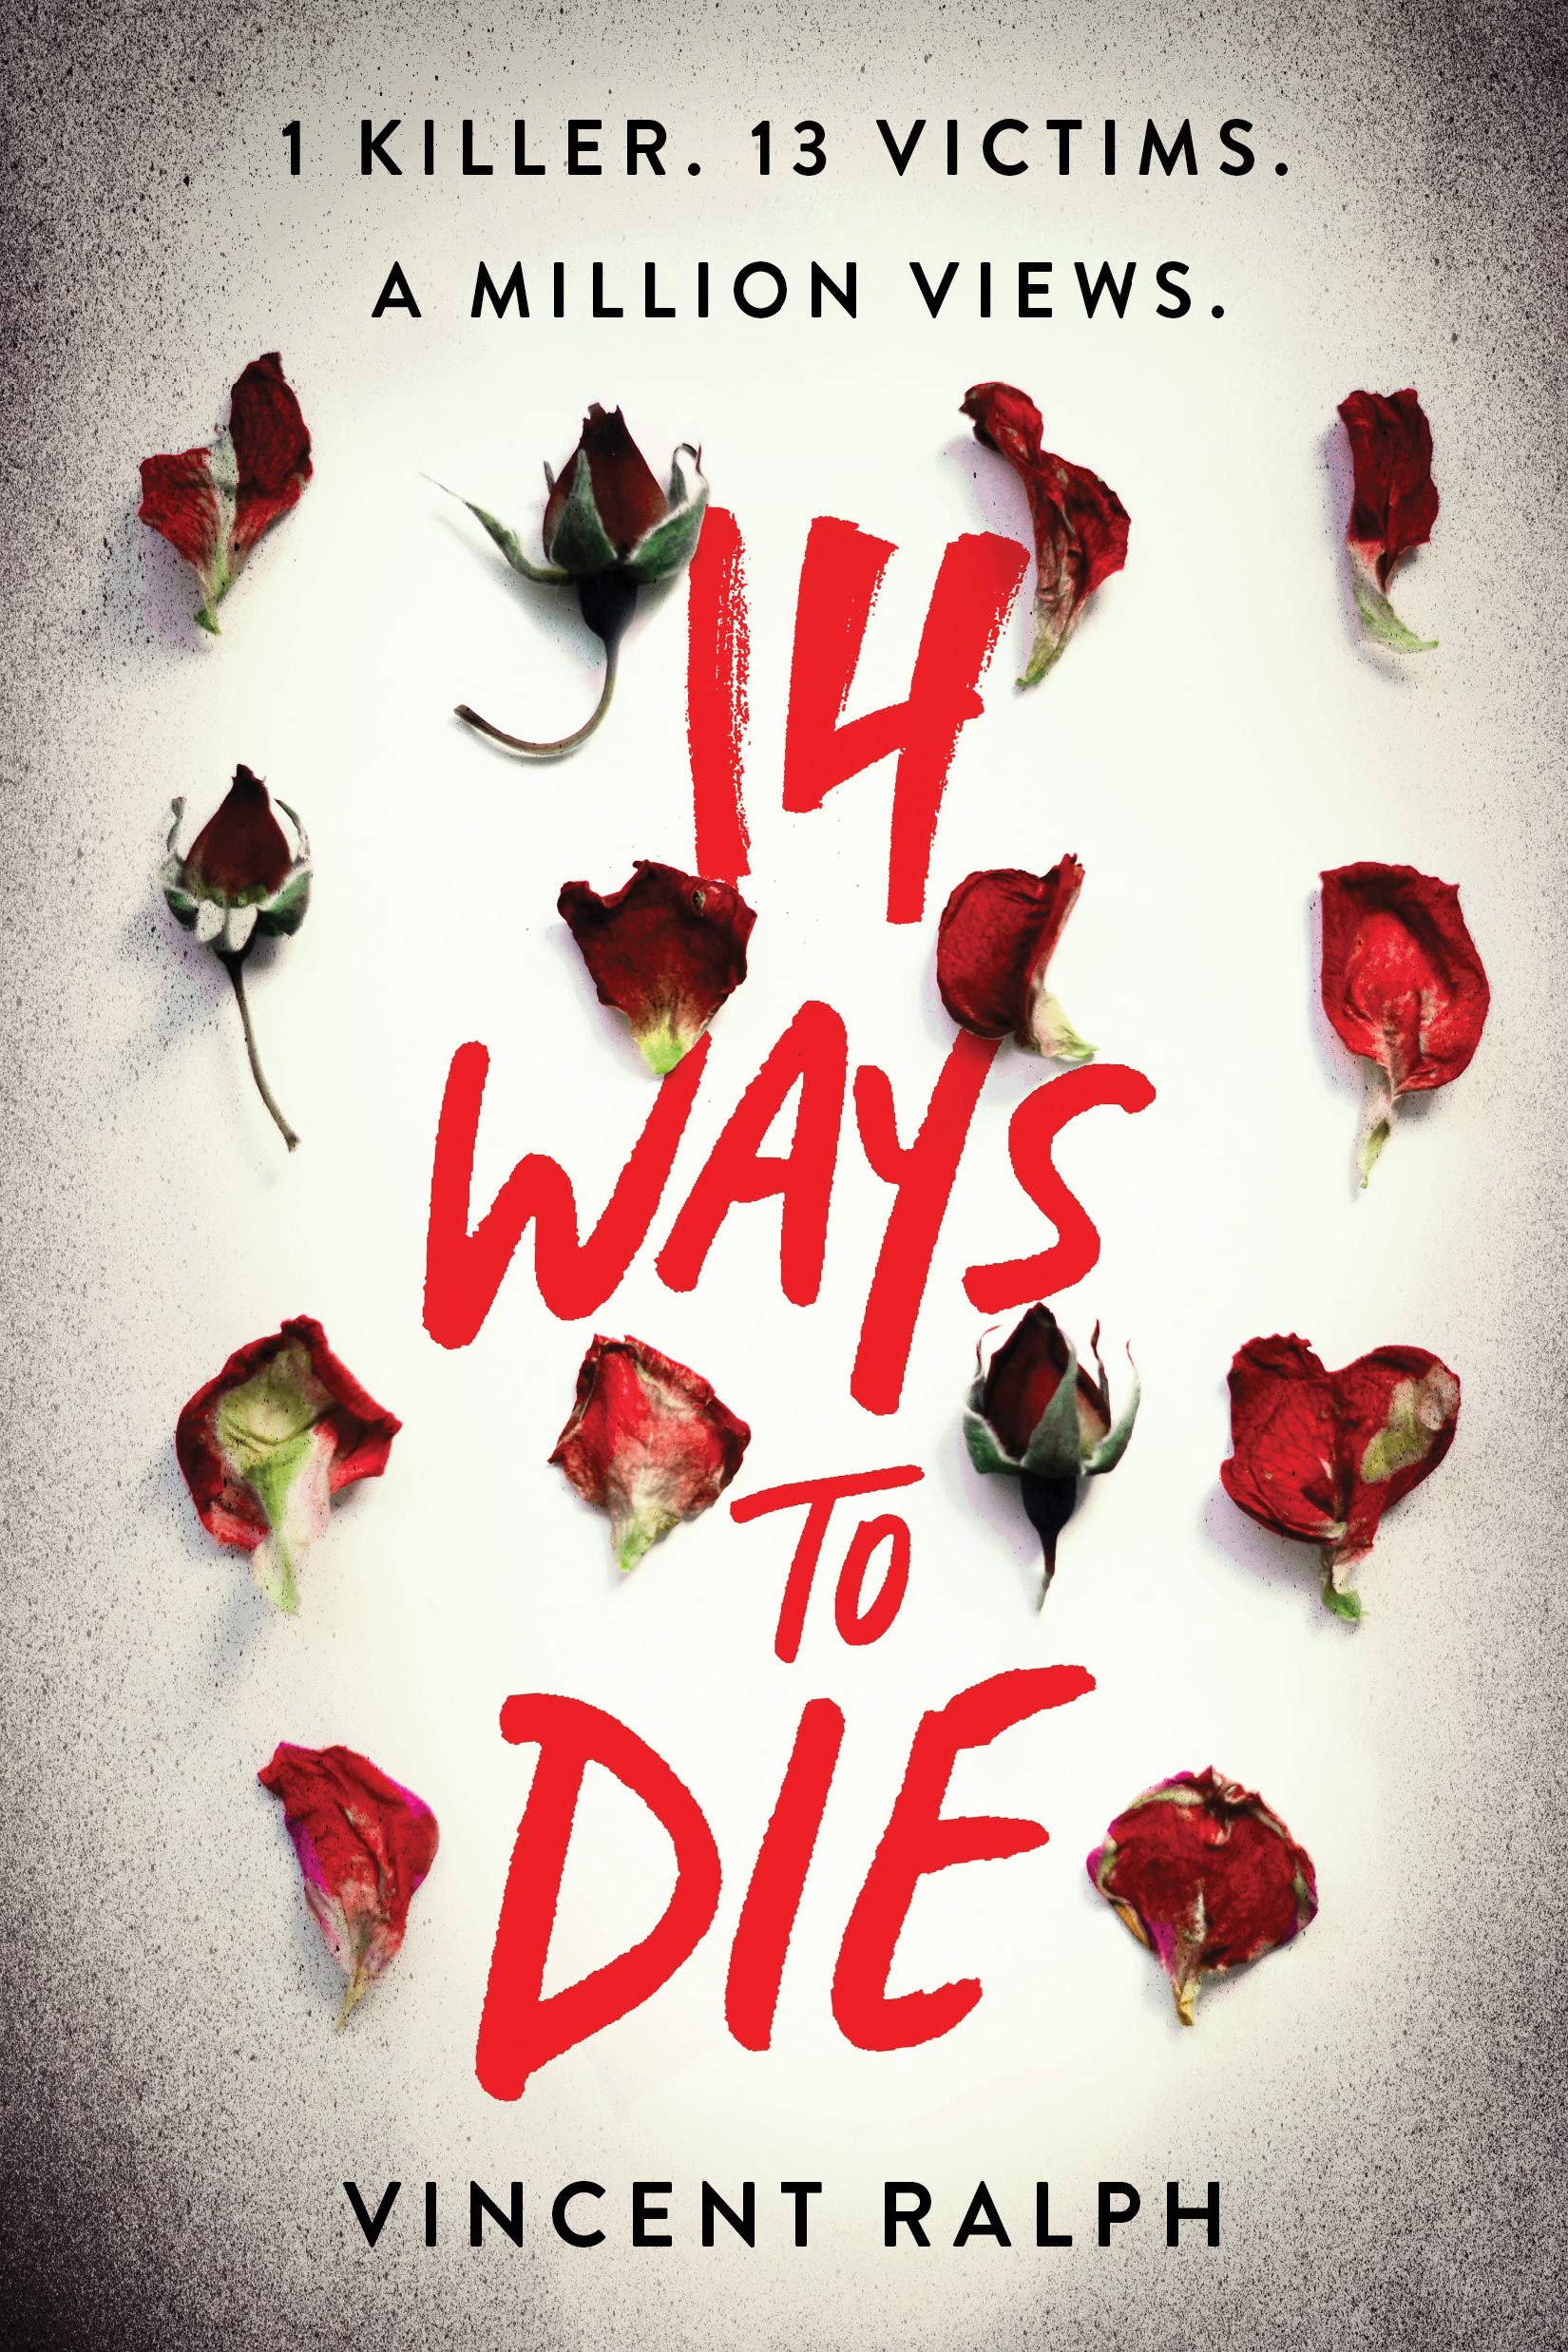 Amazon.com: 14 Ways to Die (0760789304286): Ralph, Vincent: Books